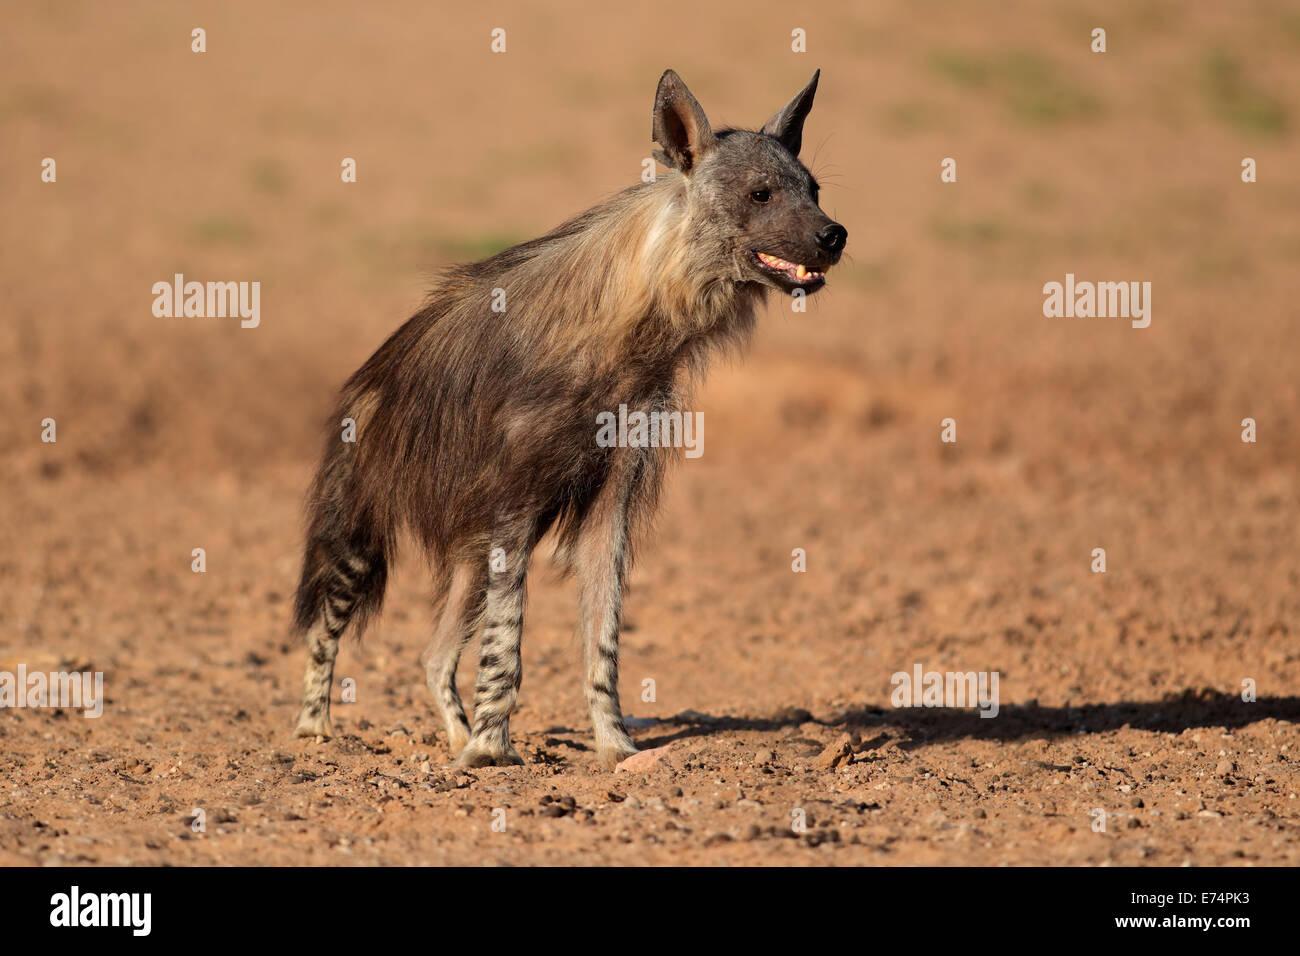 Avviso iena marrone (Hyaena brunnea), Deserto Kalahari, Sud Africa Immagini Stock